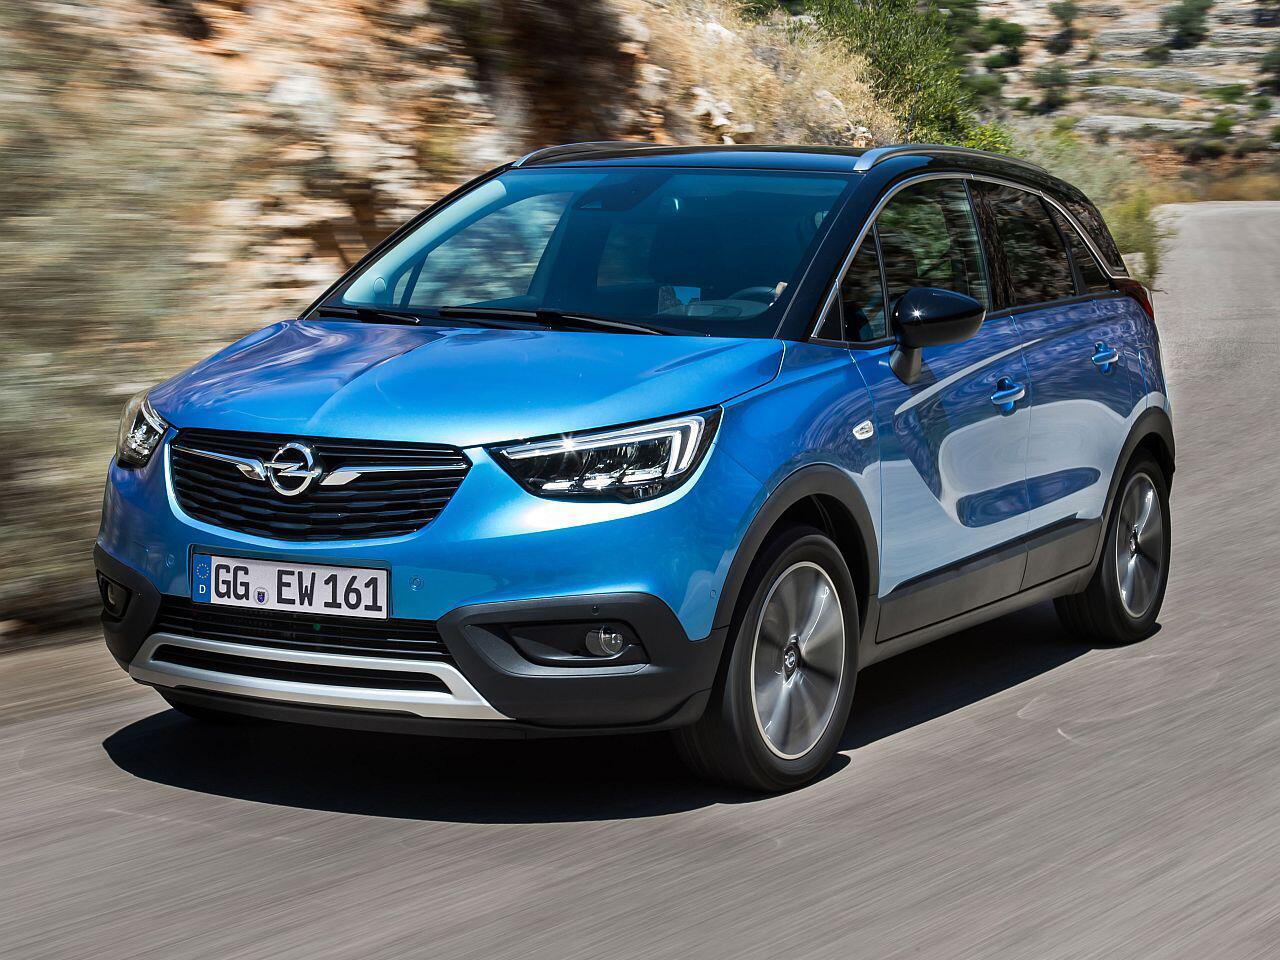 Bild zu Platz 13: Opel Crossland X